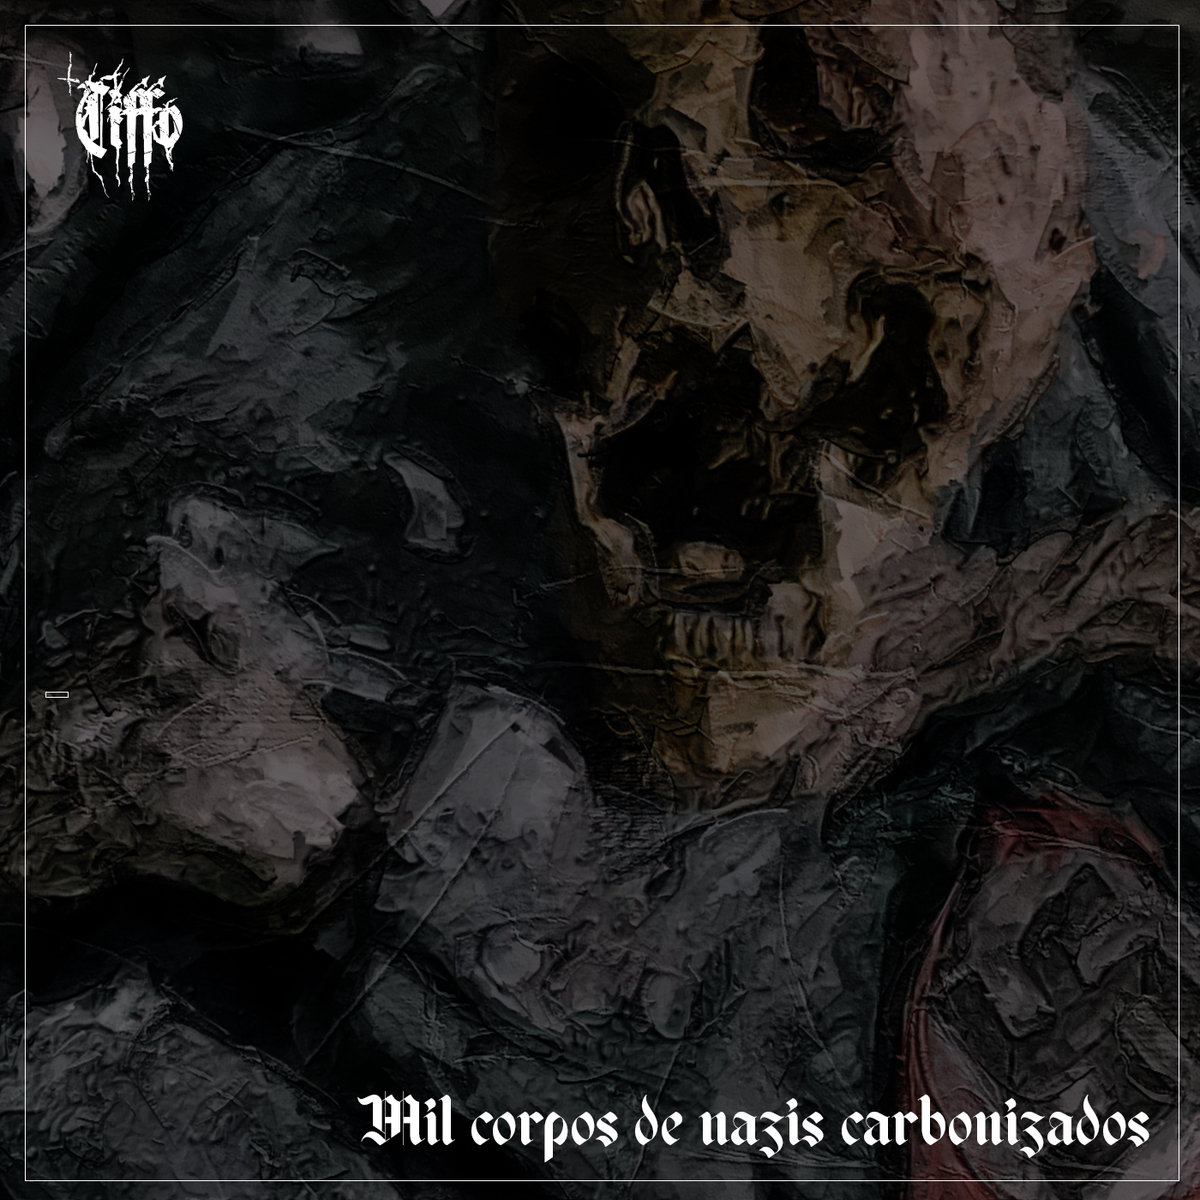 https://tiffocrust.bandcamp.com/album/mil-corpos-de-nazis-carbonizados